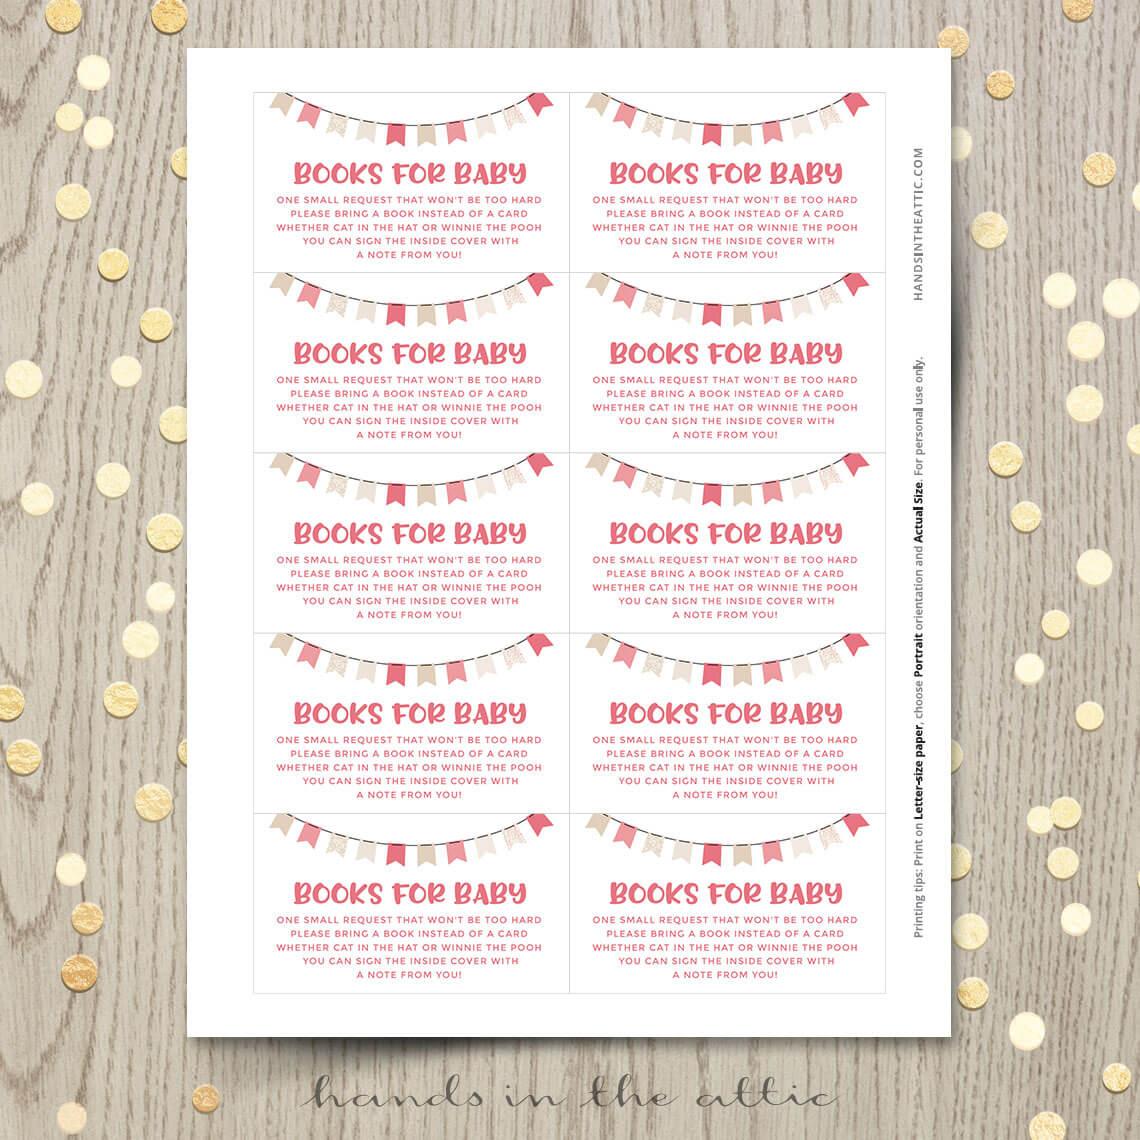 Ready to Pop Baby Shower Invitation | Printable Stationery ...